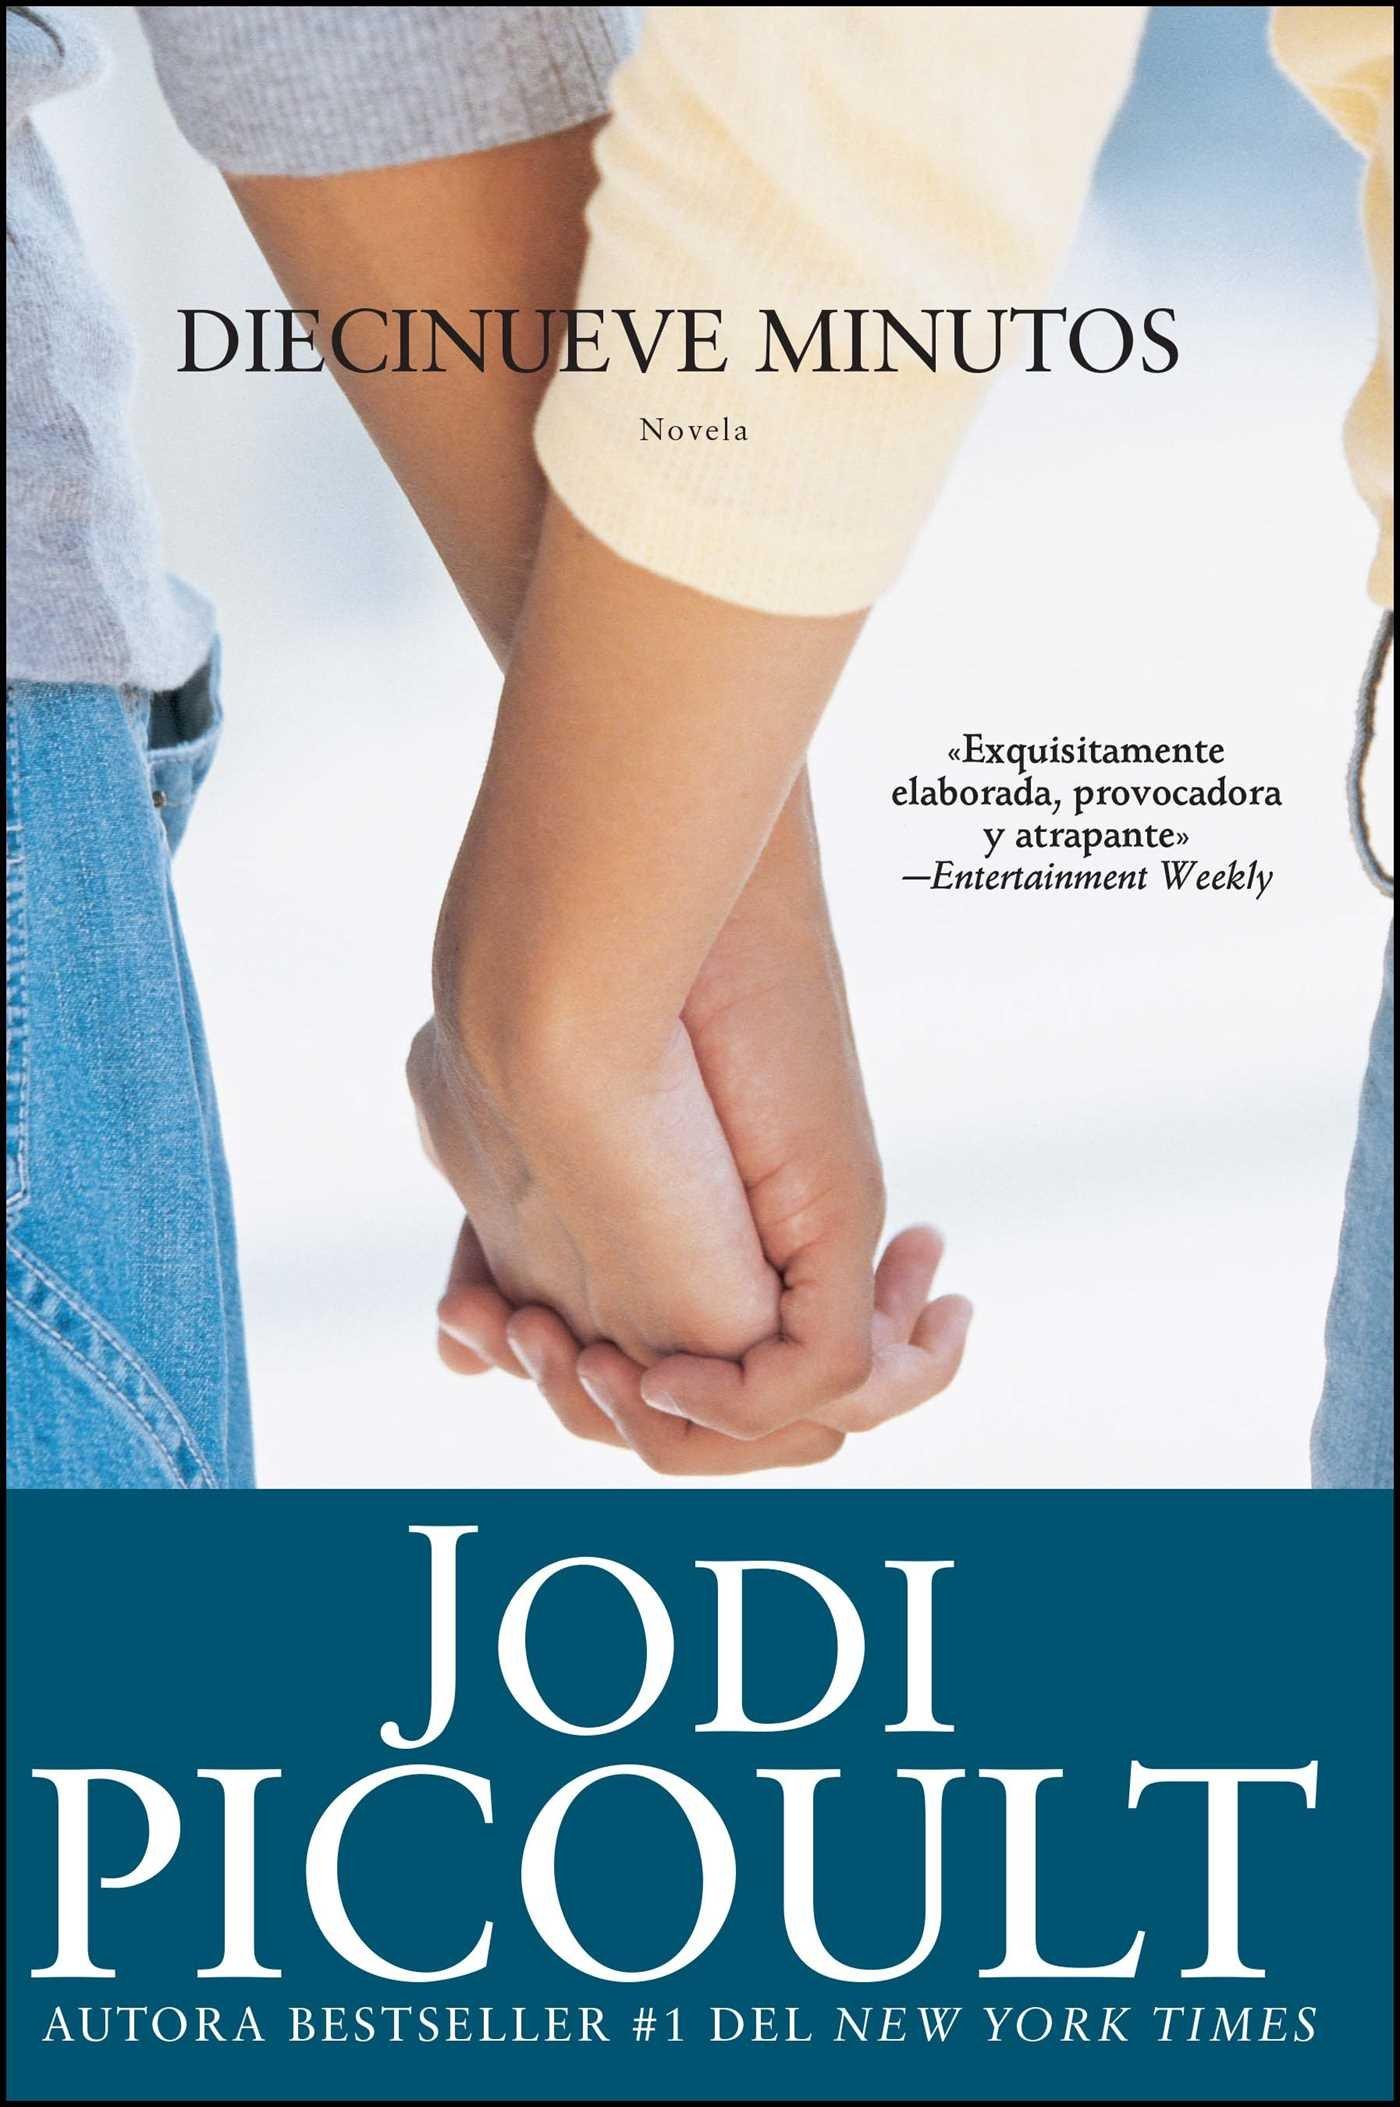 Diecinueve minutos (Nineteen Minutes: Novela (Atria Espanol) (Spanish Edition) pdf